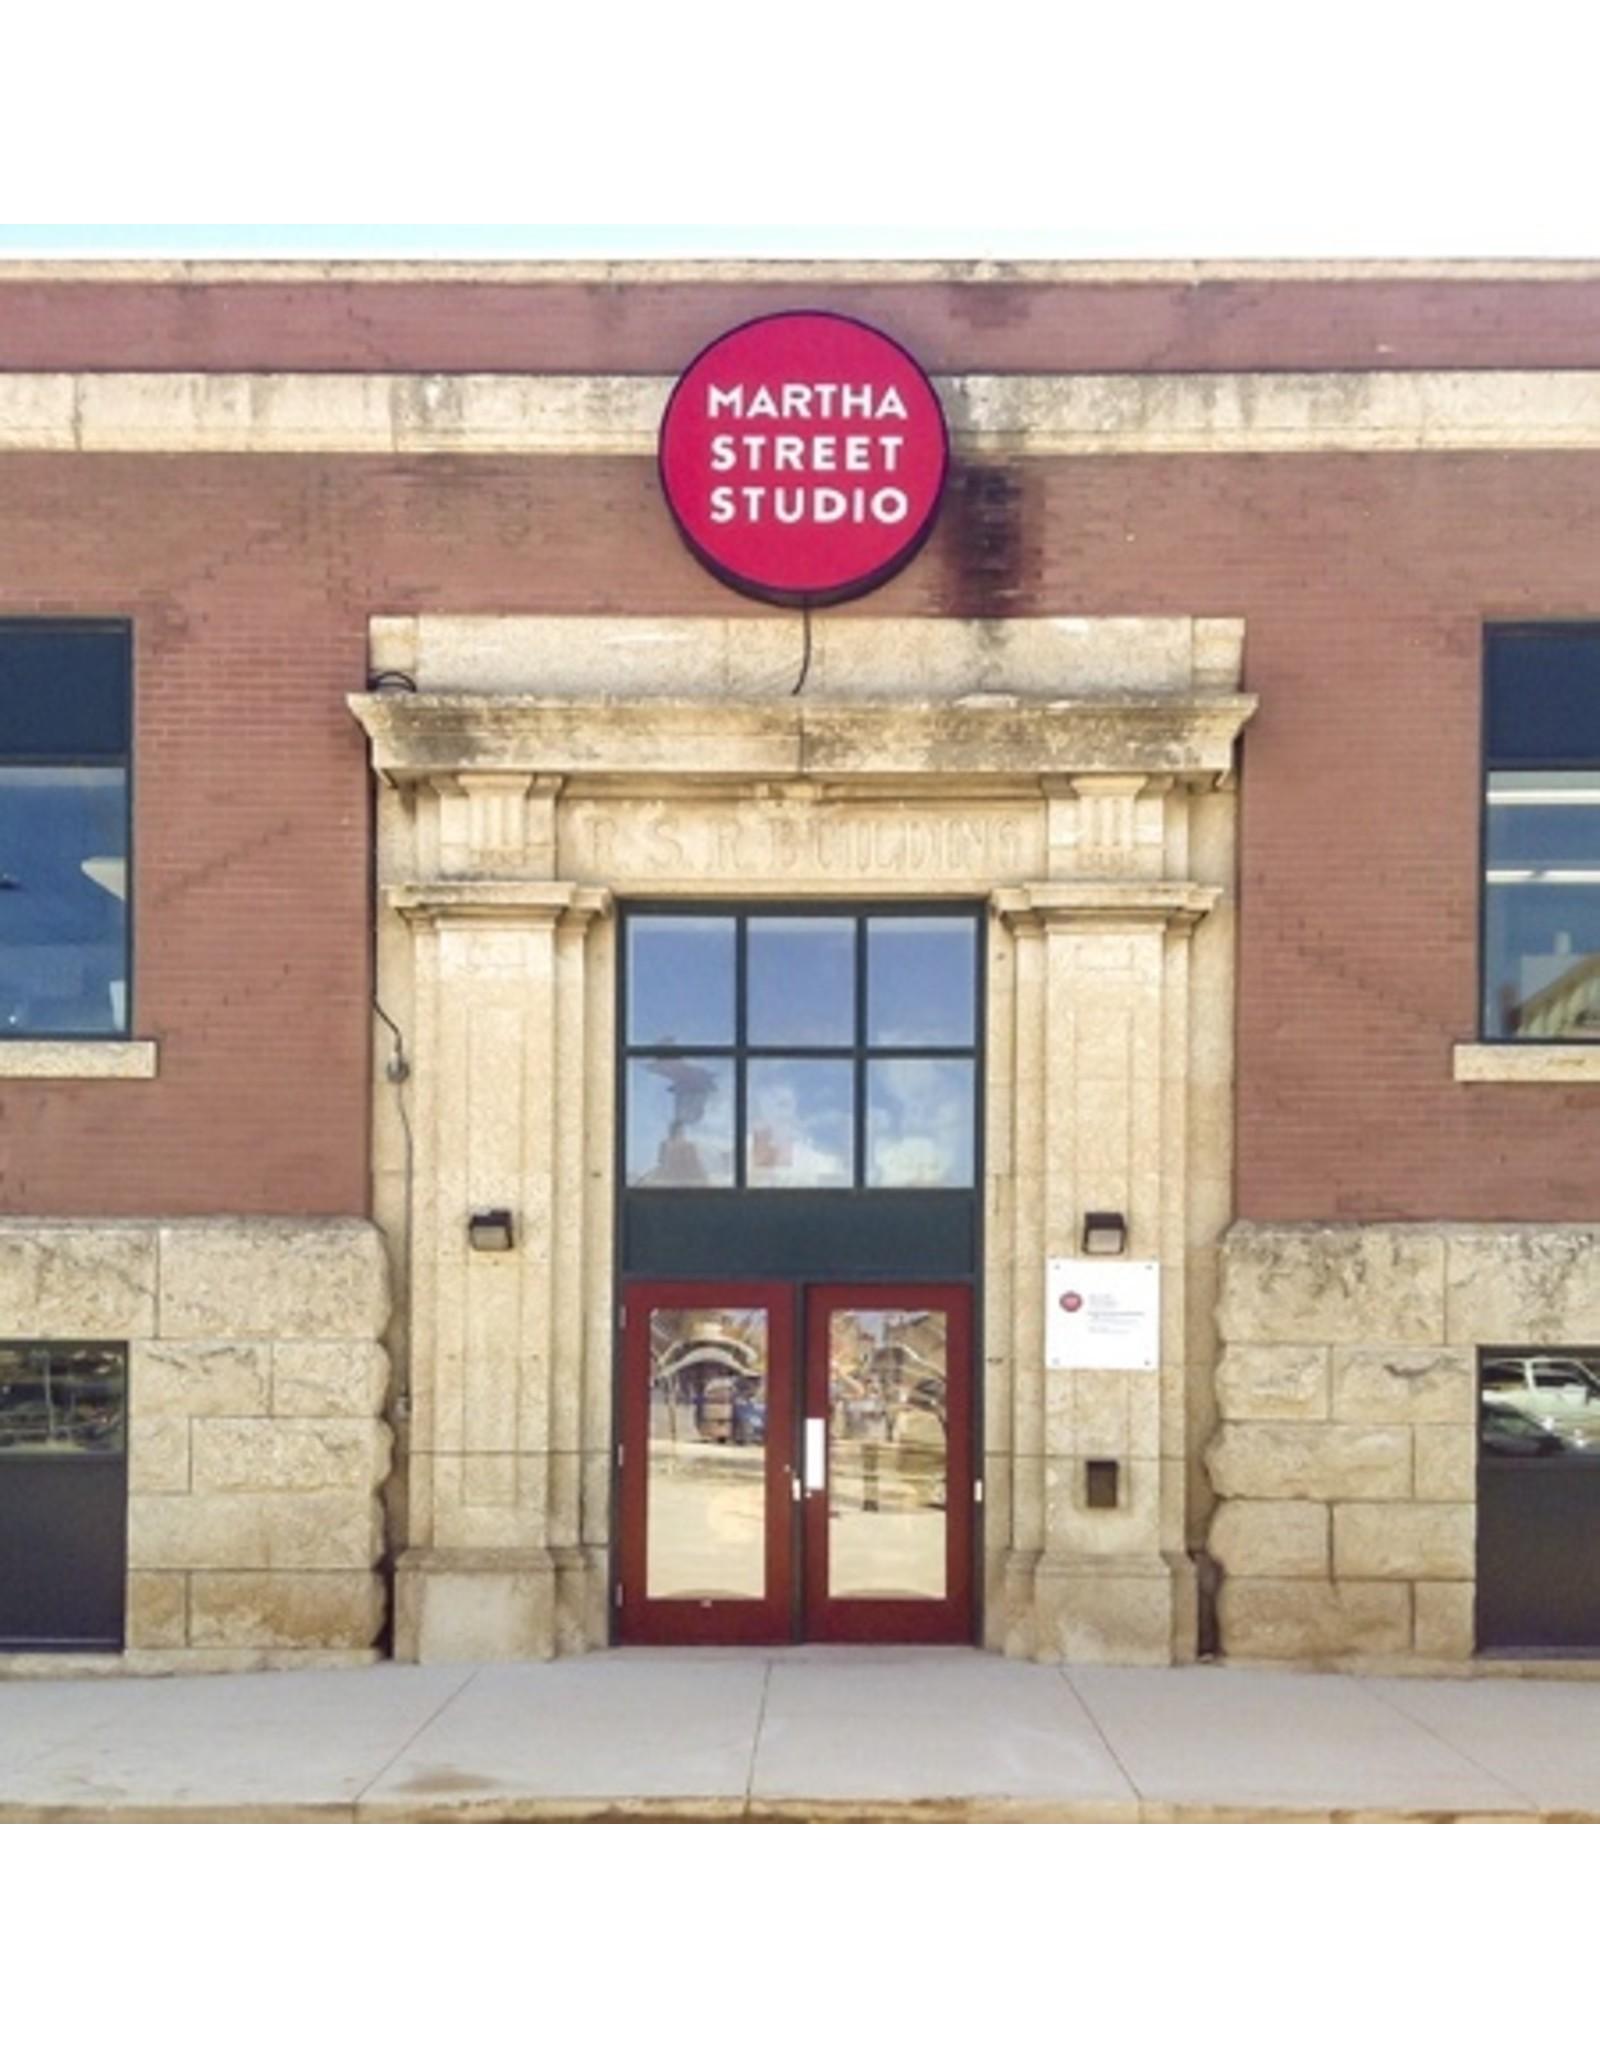 Martha Street Studio 1 year membership - Regular